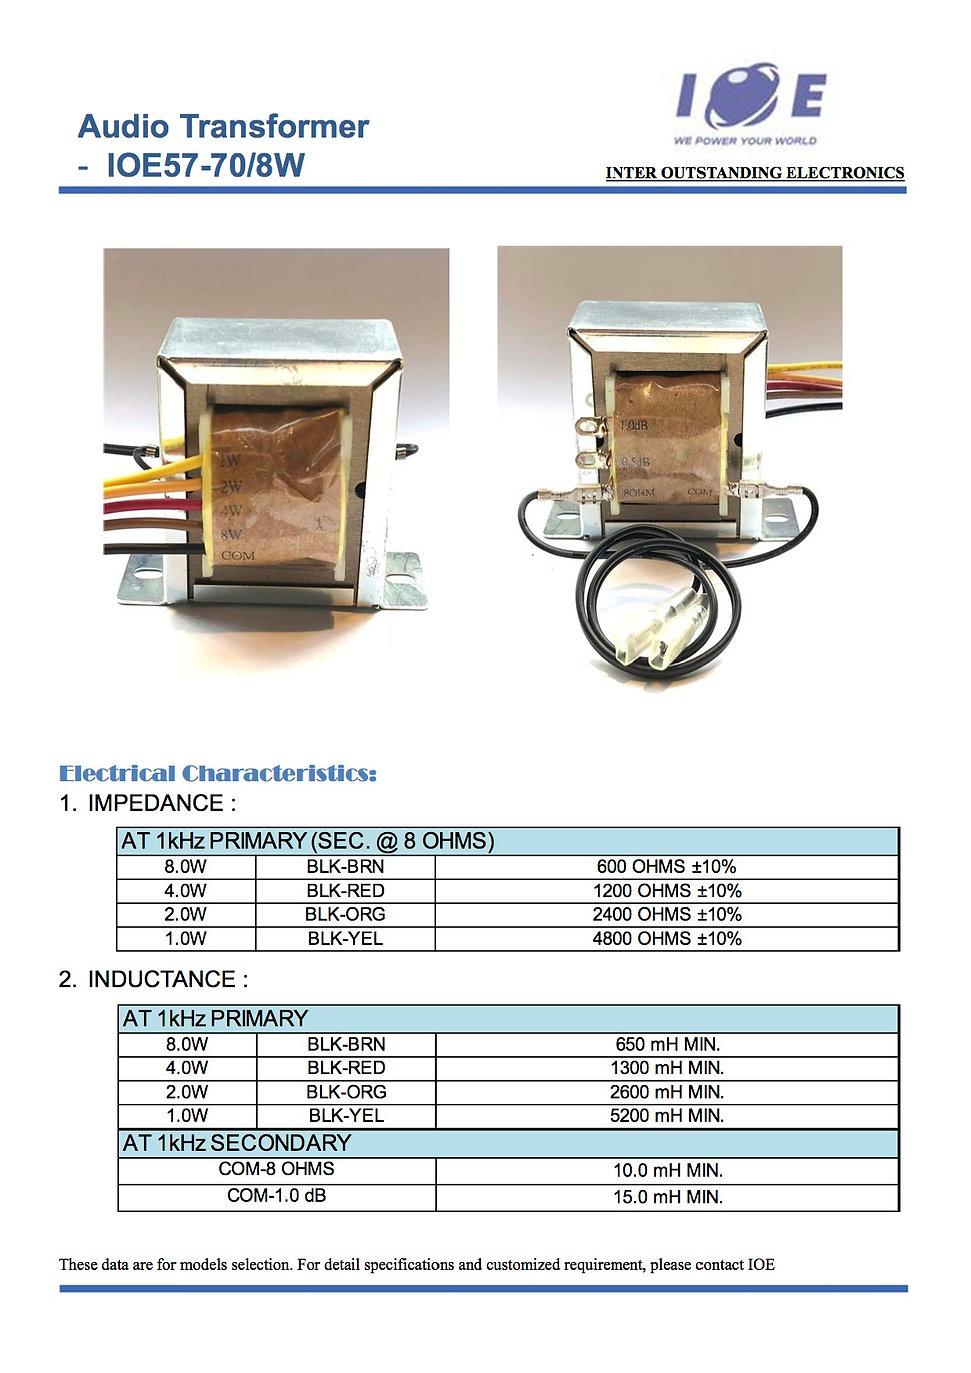 Audio Transformer_IOE57-70-8W.jpg